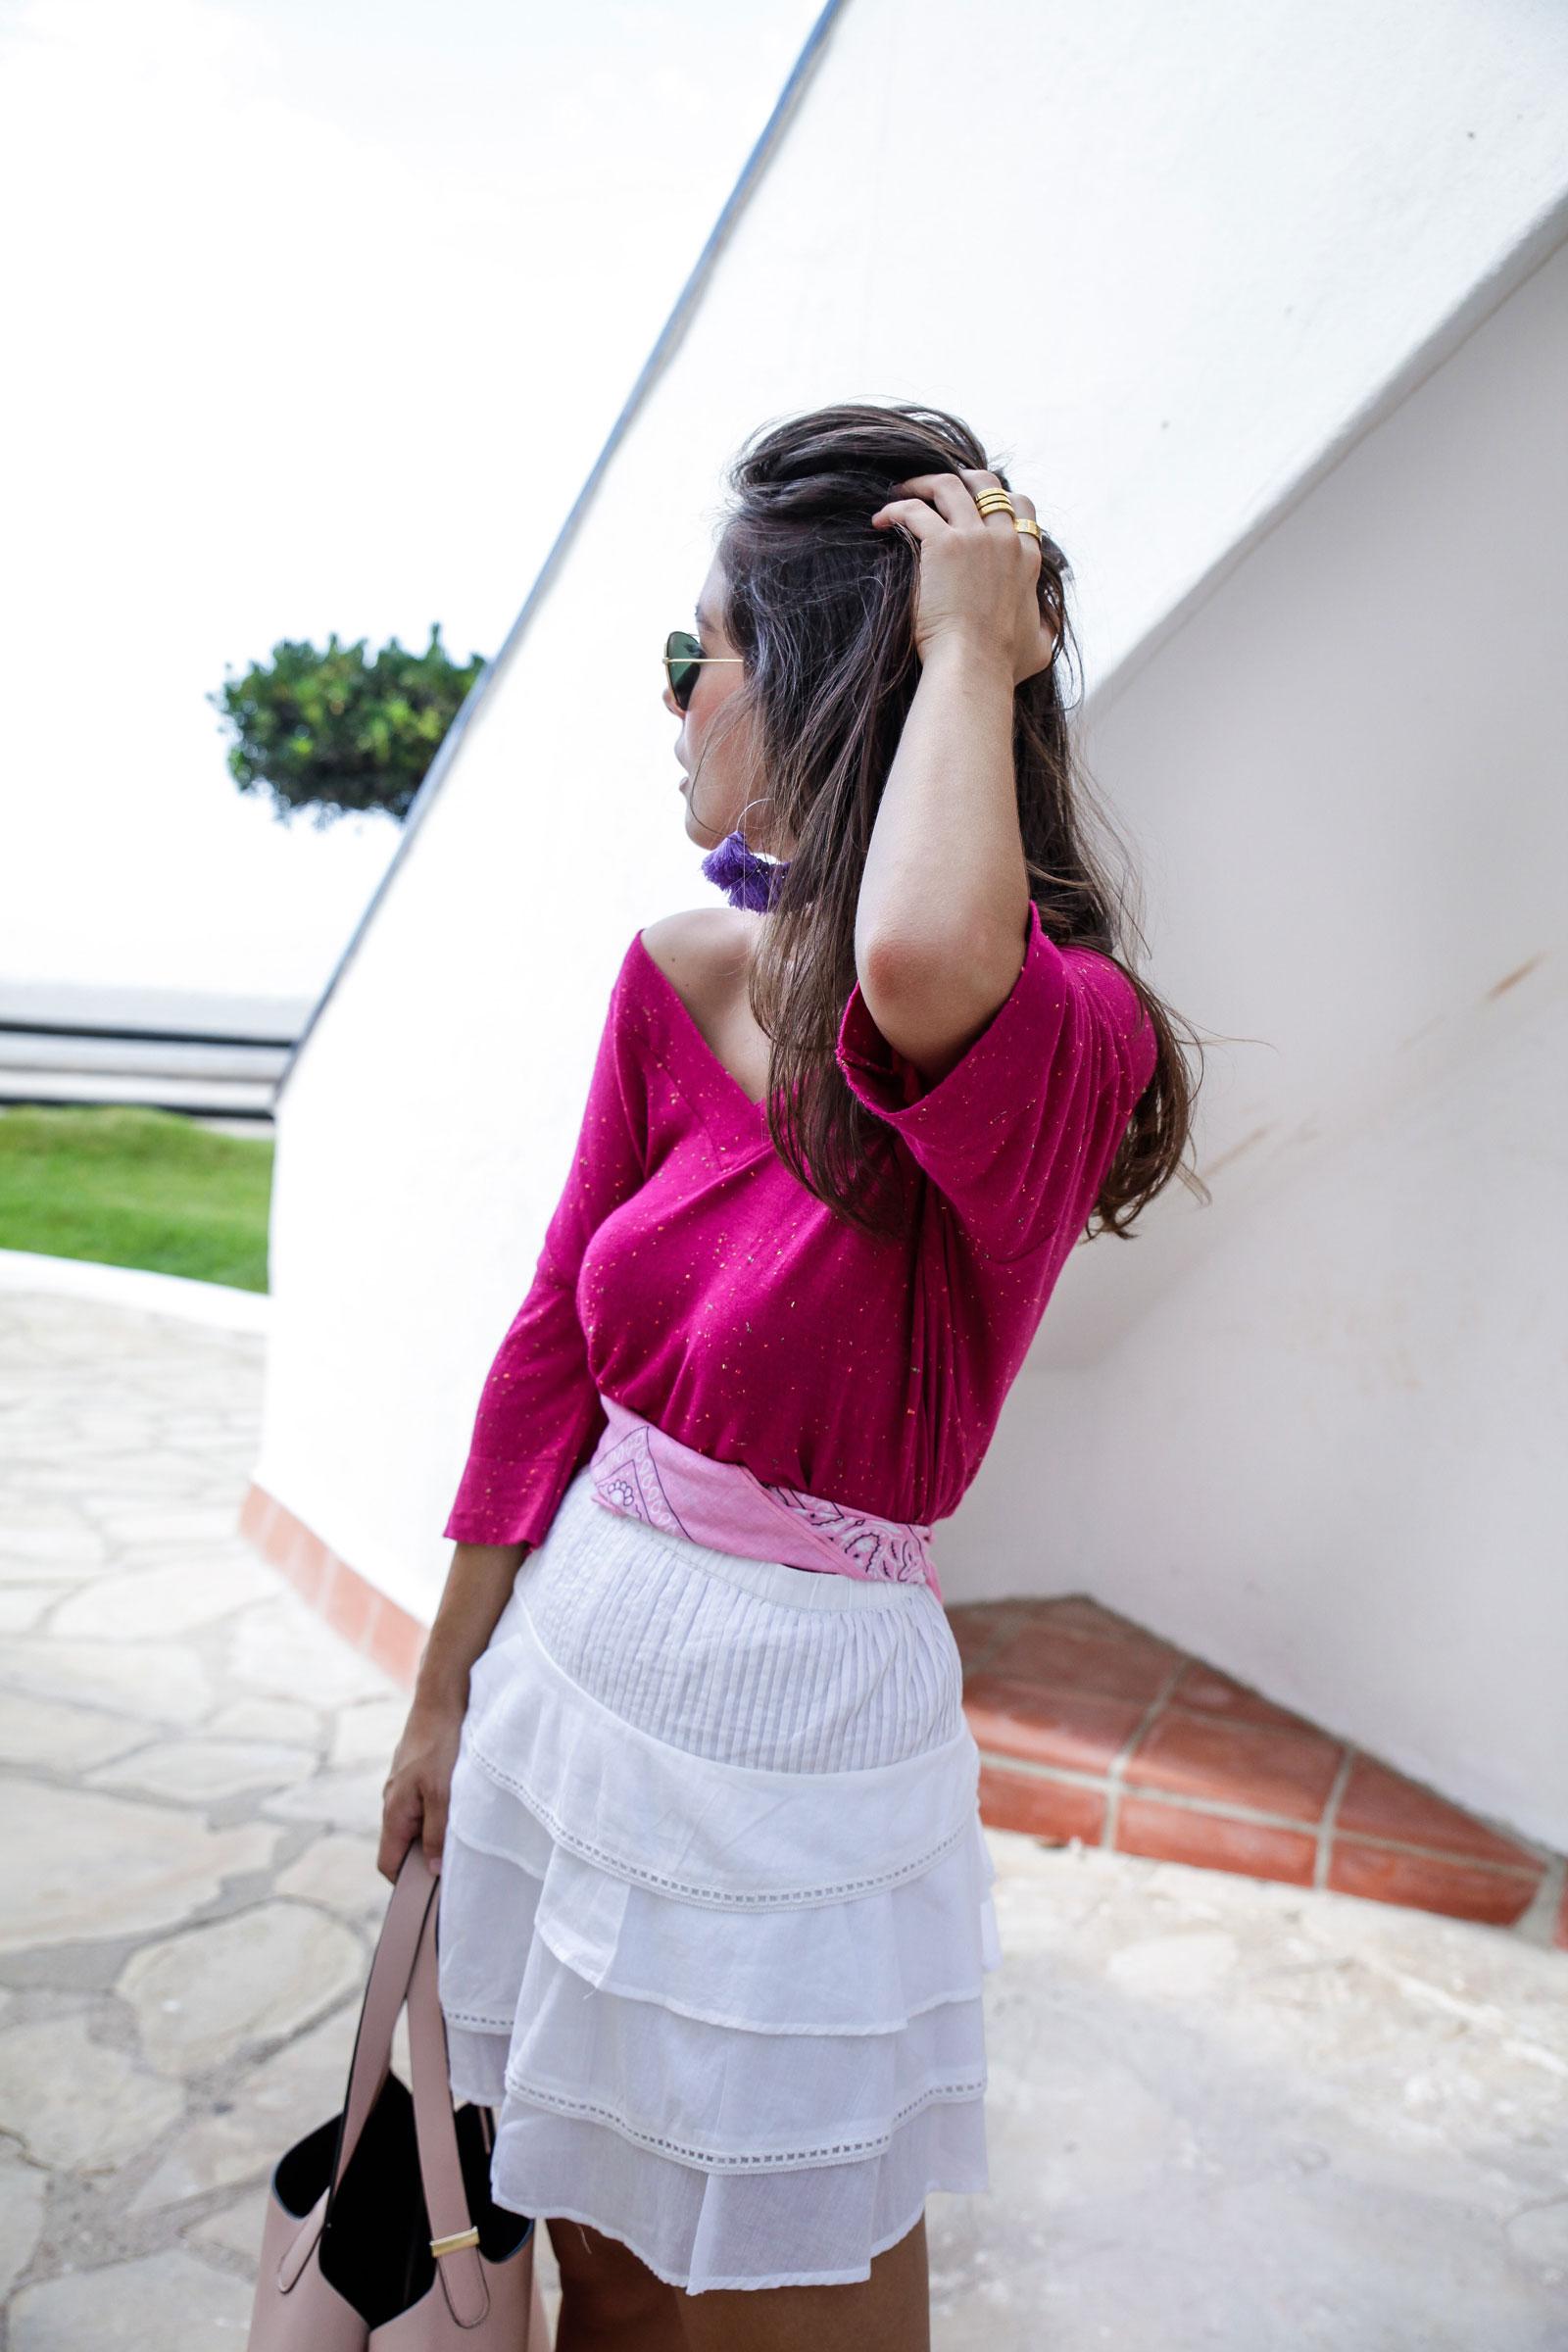 03_Camiseta_rosa_rüga_falda_blanca_look_verano_theguestgirl_laura_influencer_barcelona_españa_spain_ootd_inspo